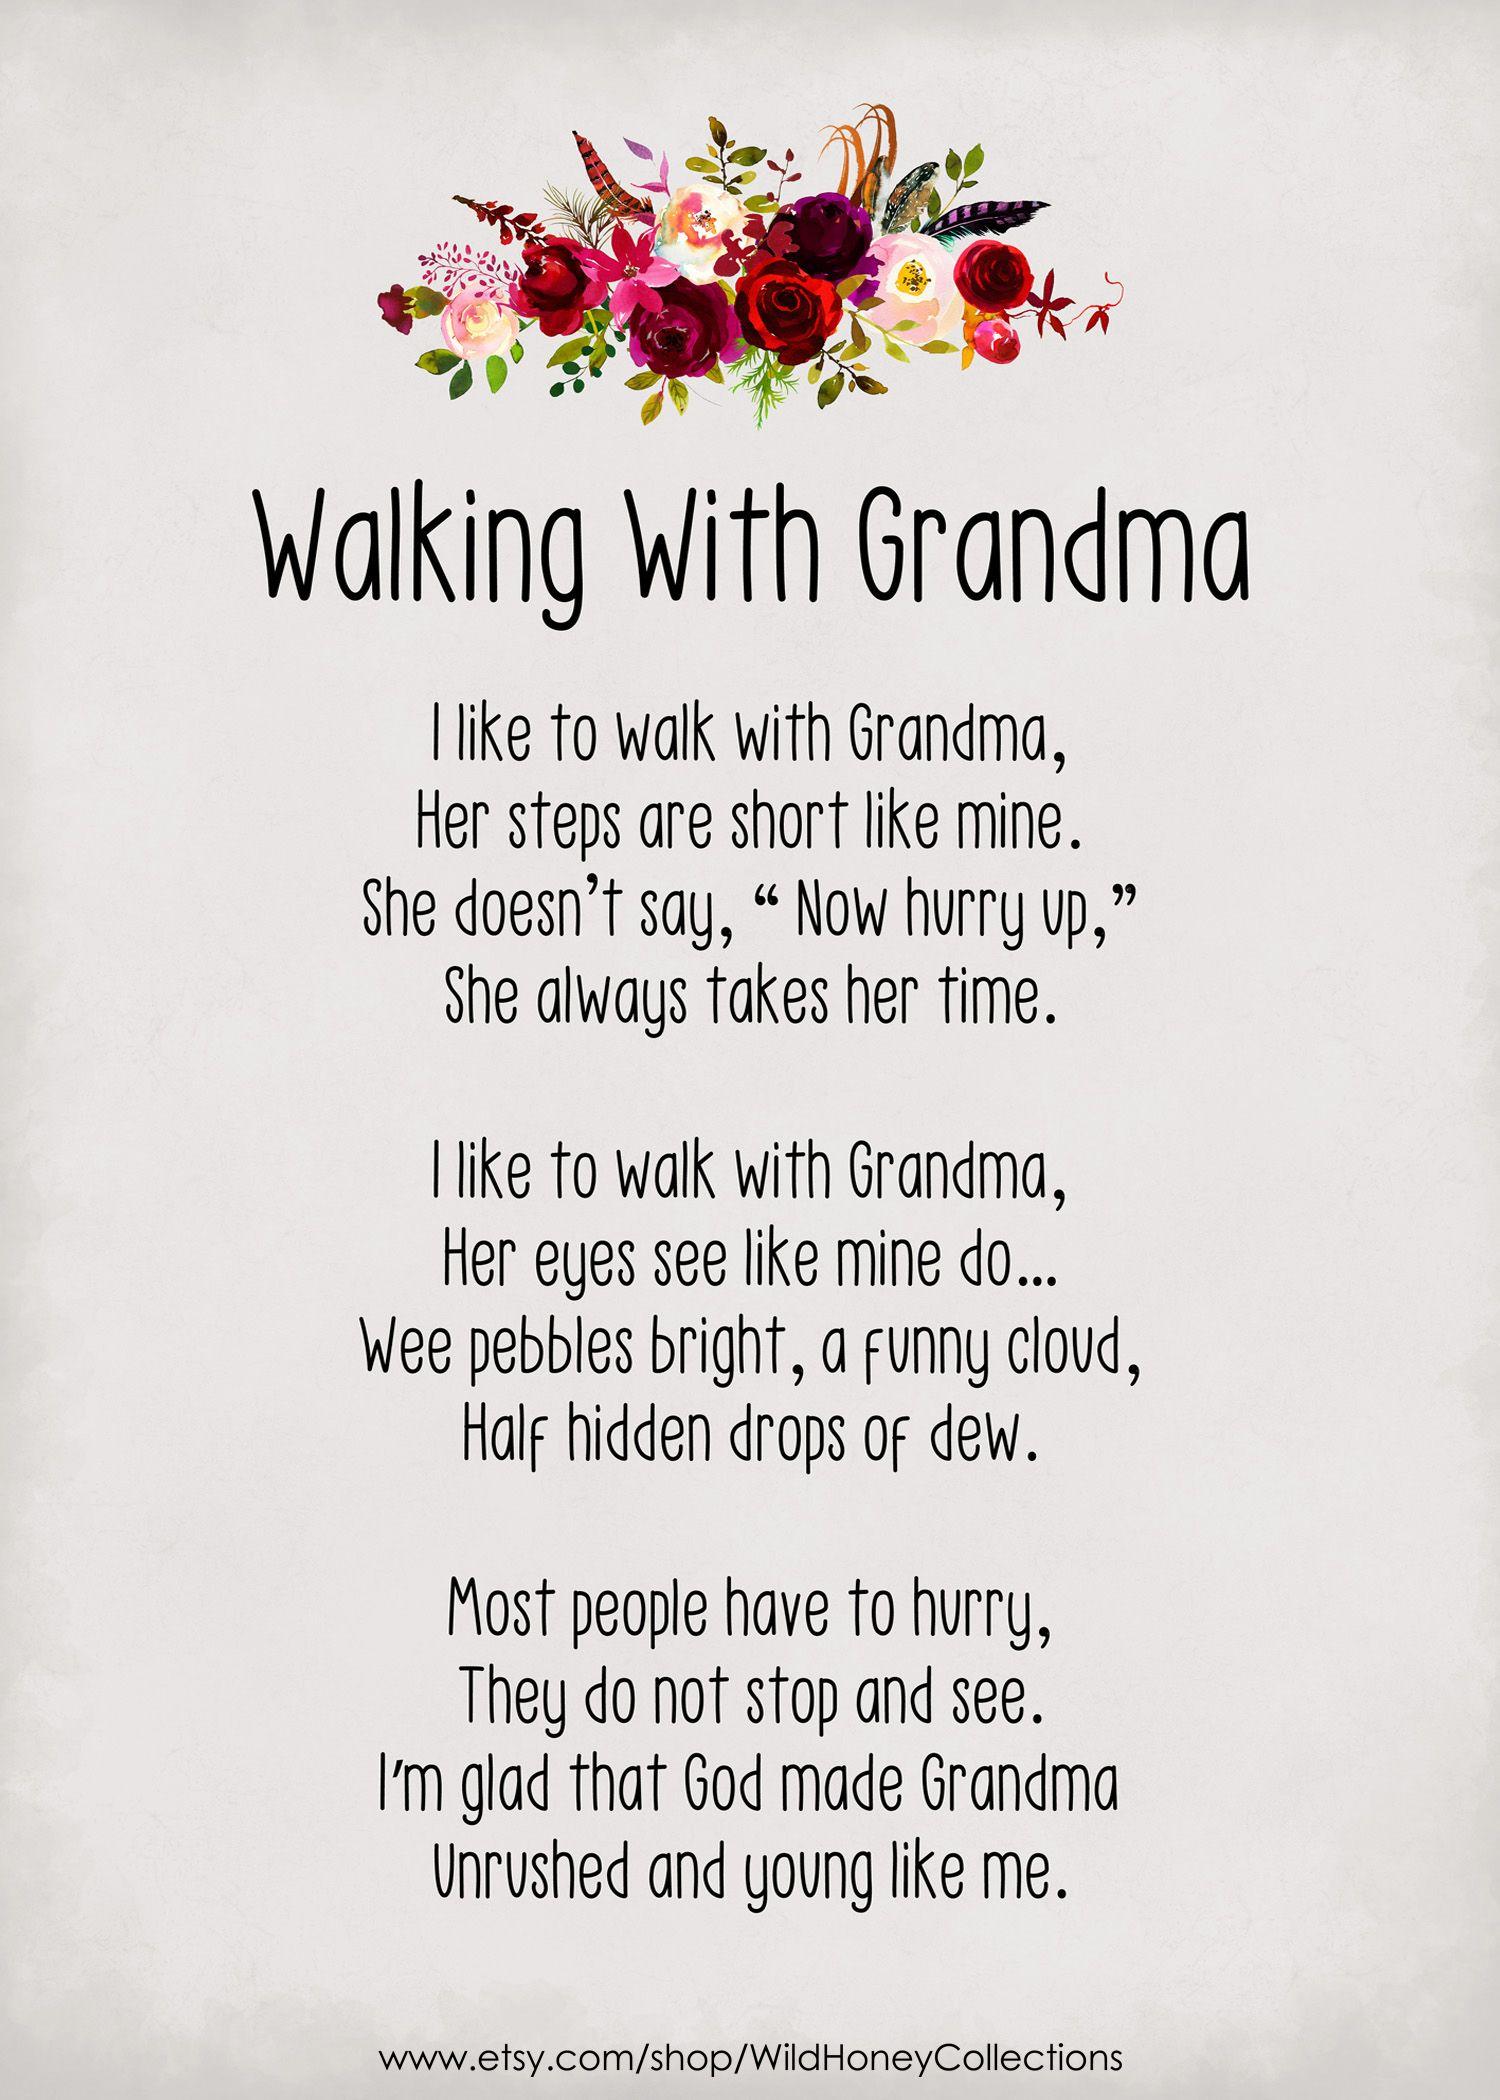 Walking With Grandma Poem Gift For Grandma Granny Mimi Meme Grams Grandparent Gift Instant Digital Download In 2021 Grandma Poem Grandma Quotes Grandparents Quotes